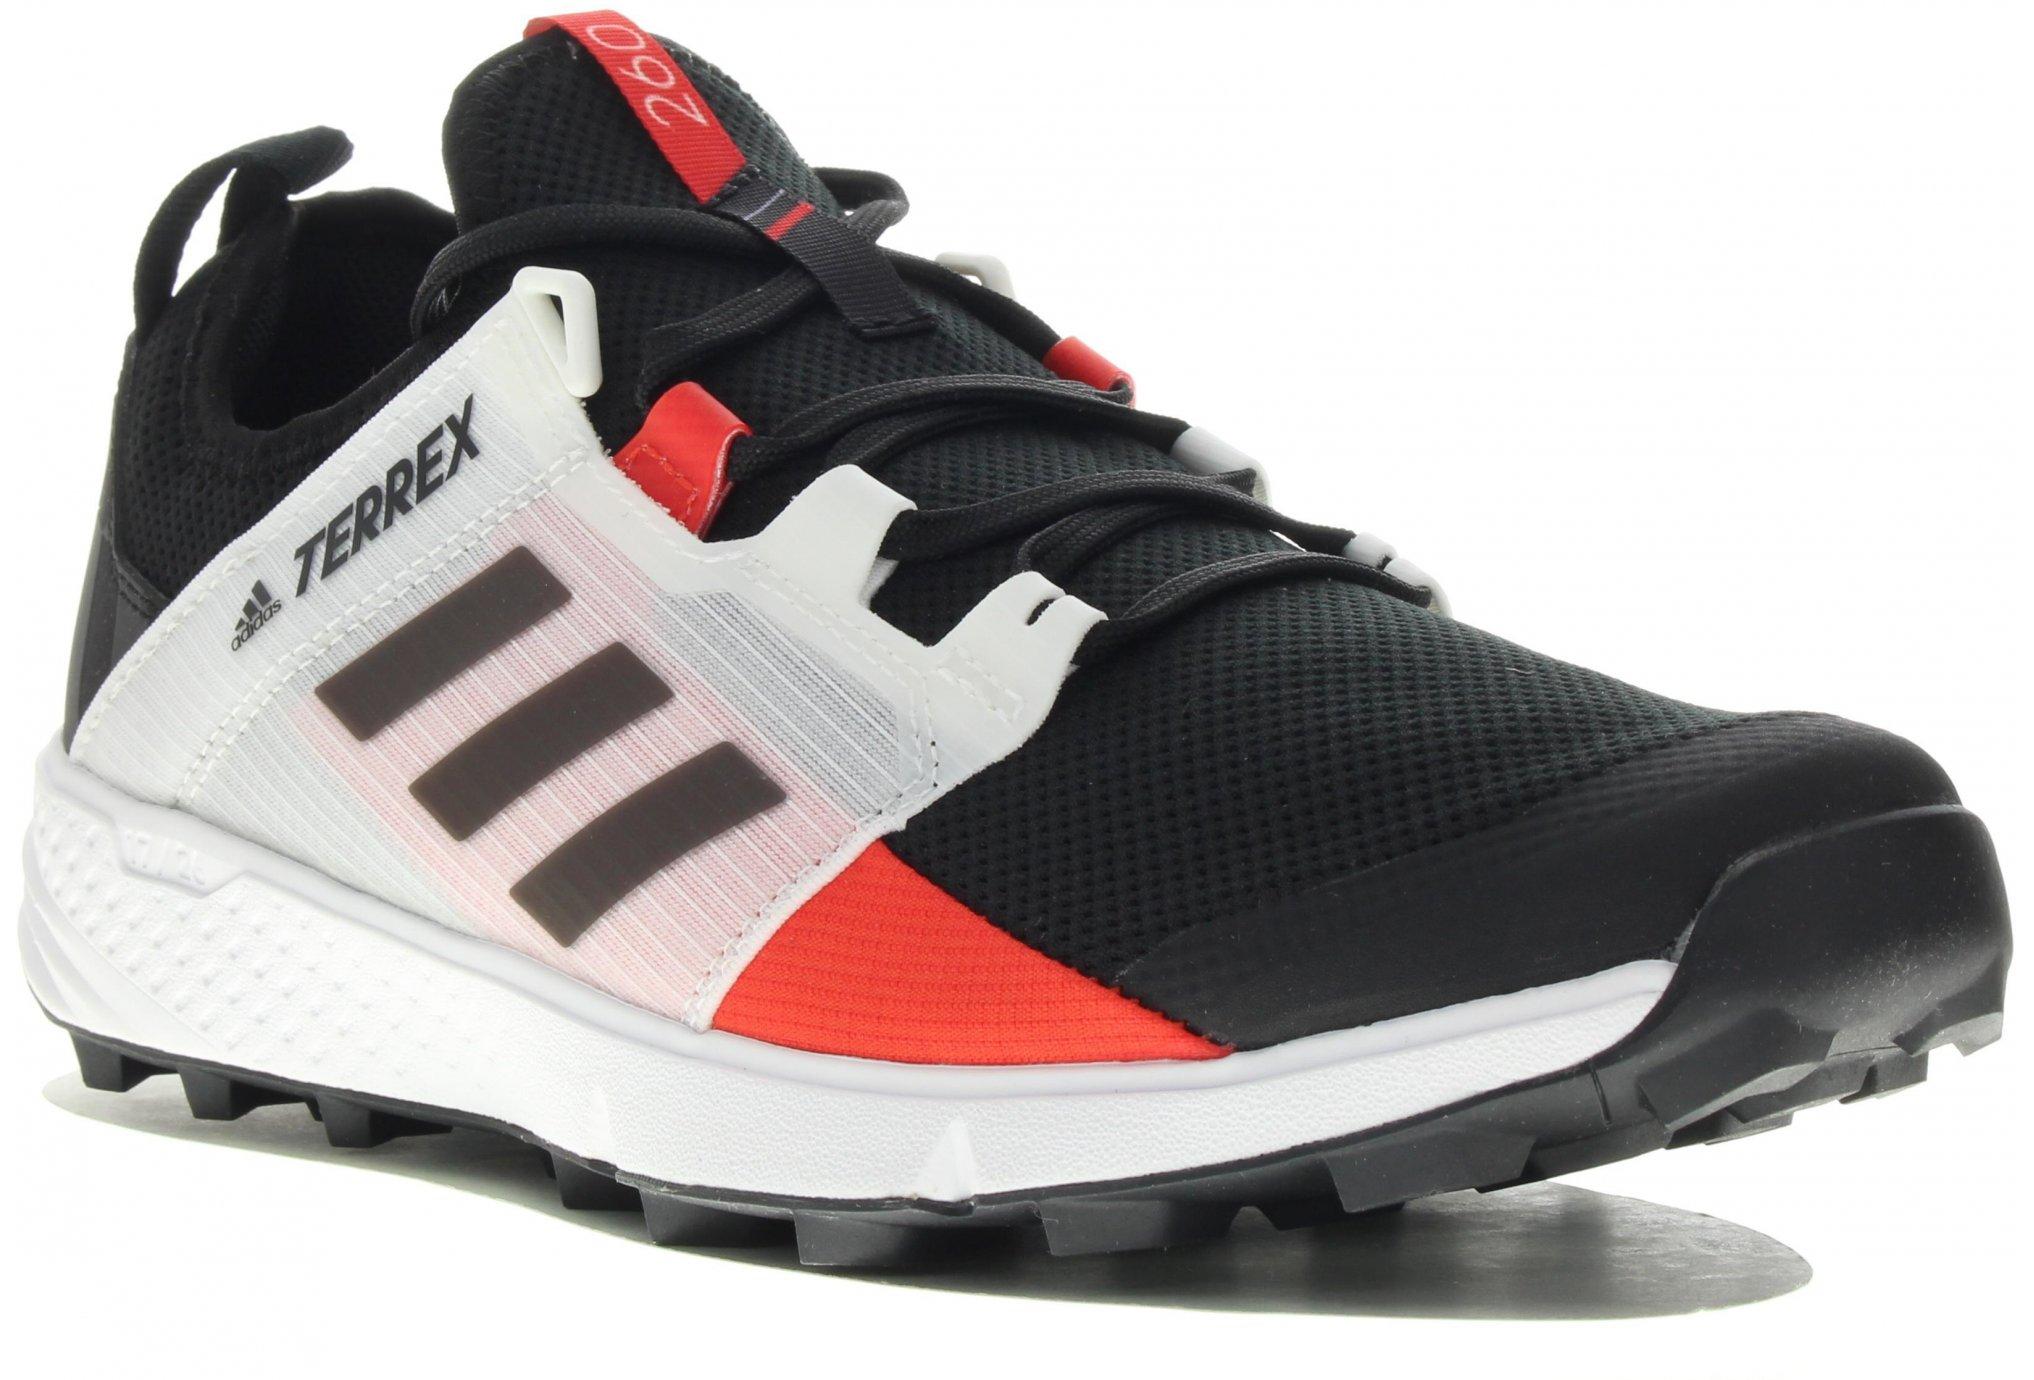 adidas Terrex Speed LD M Chaussures homme Trails Endurance Mag